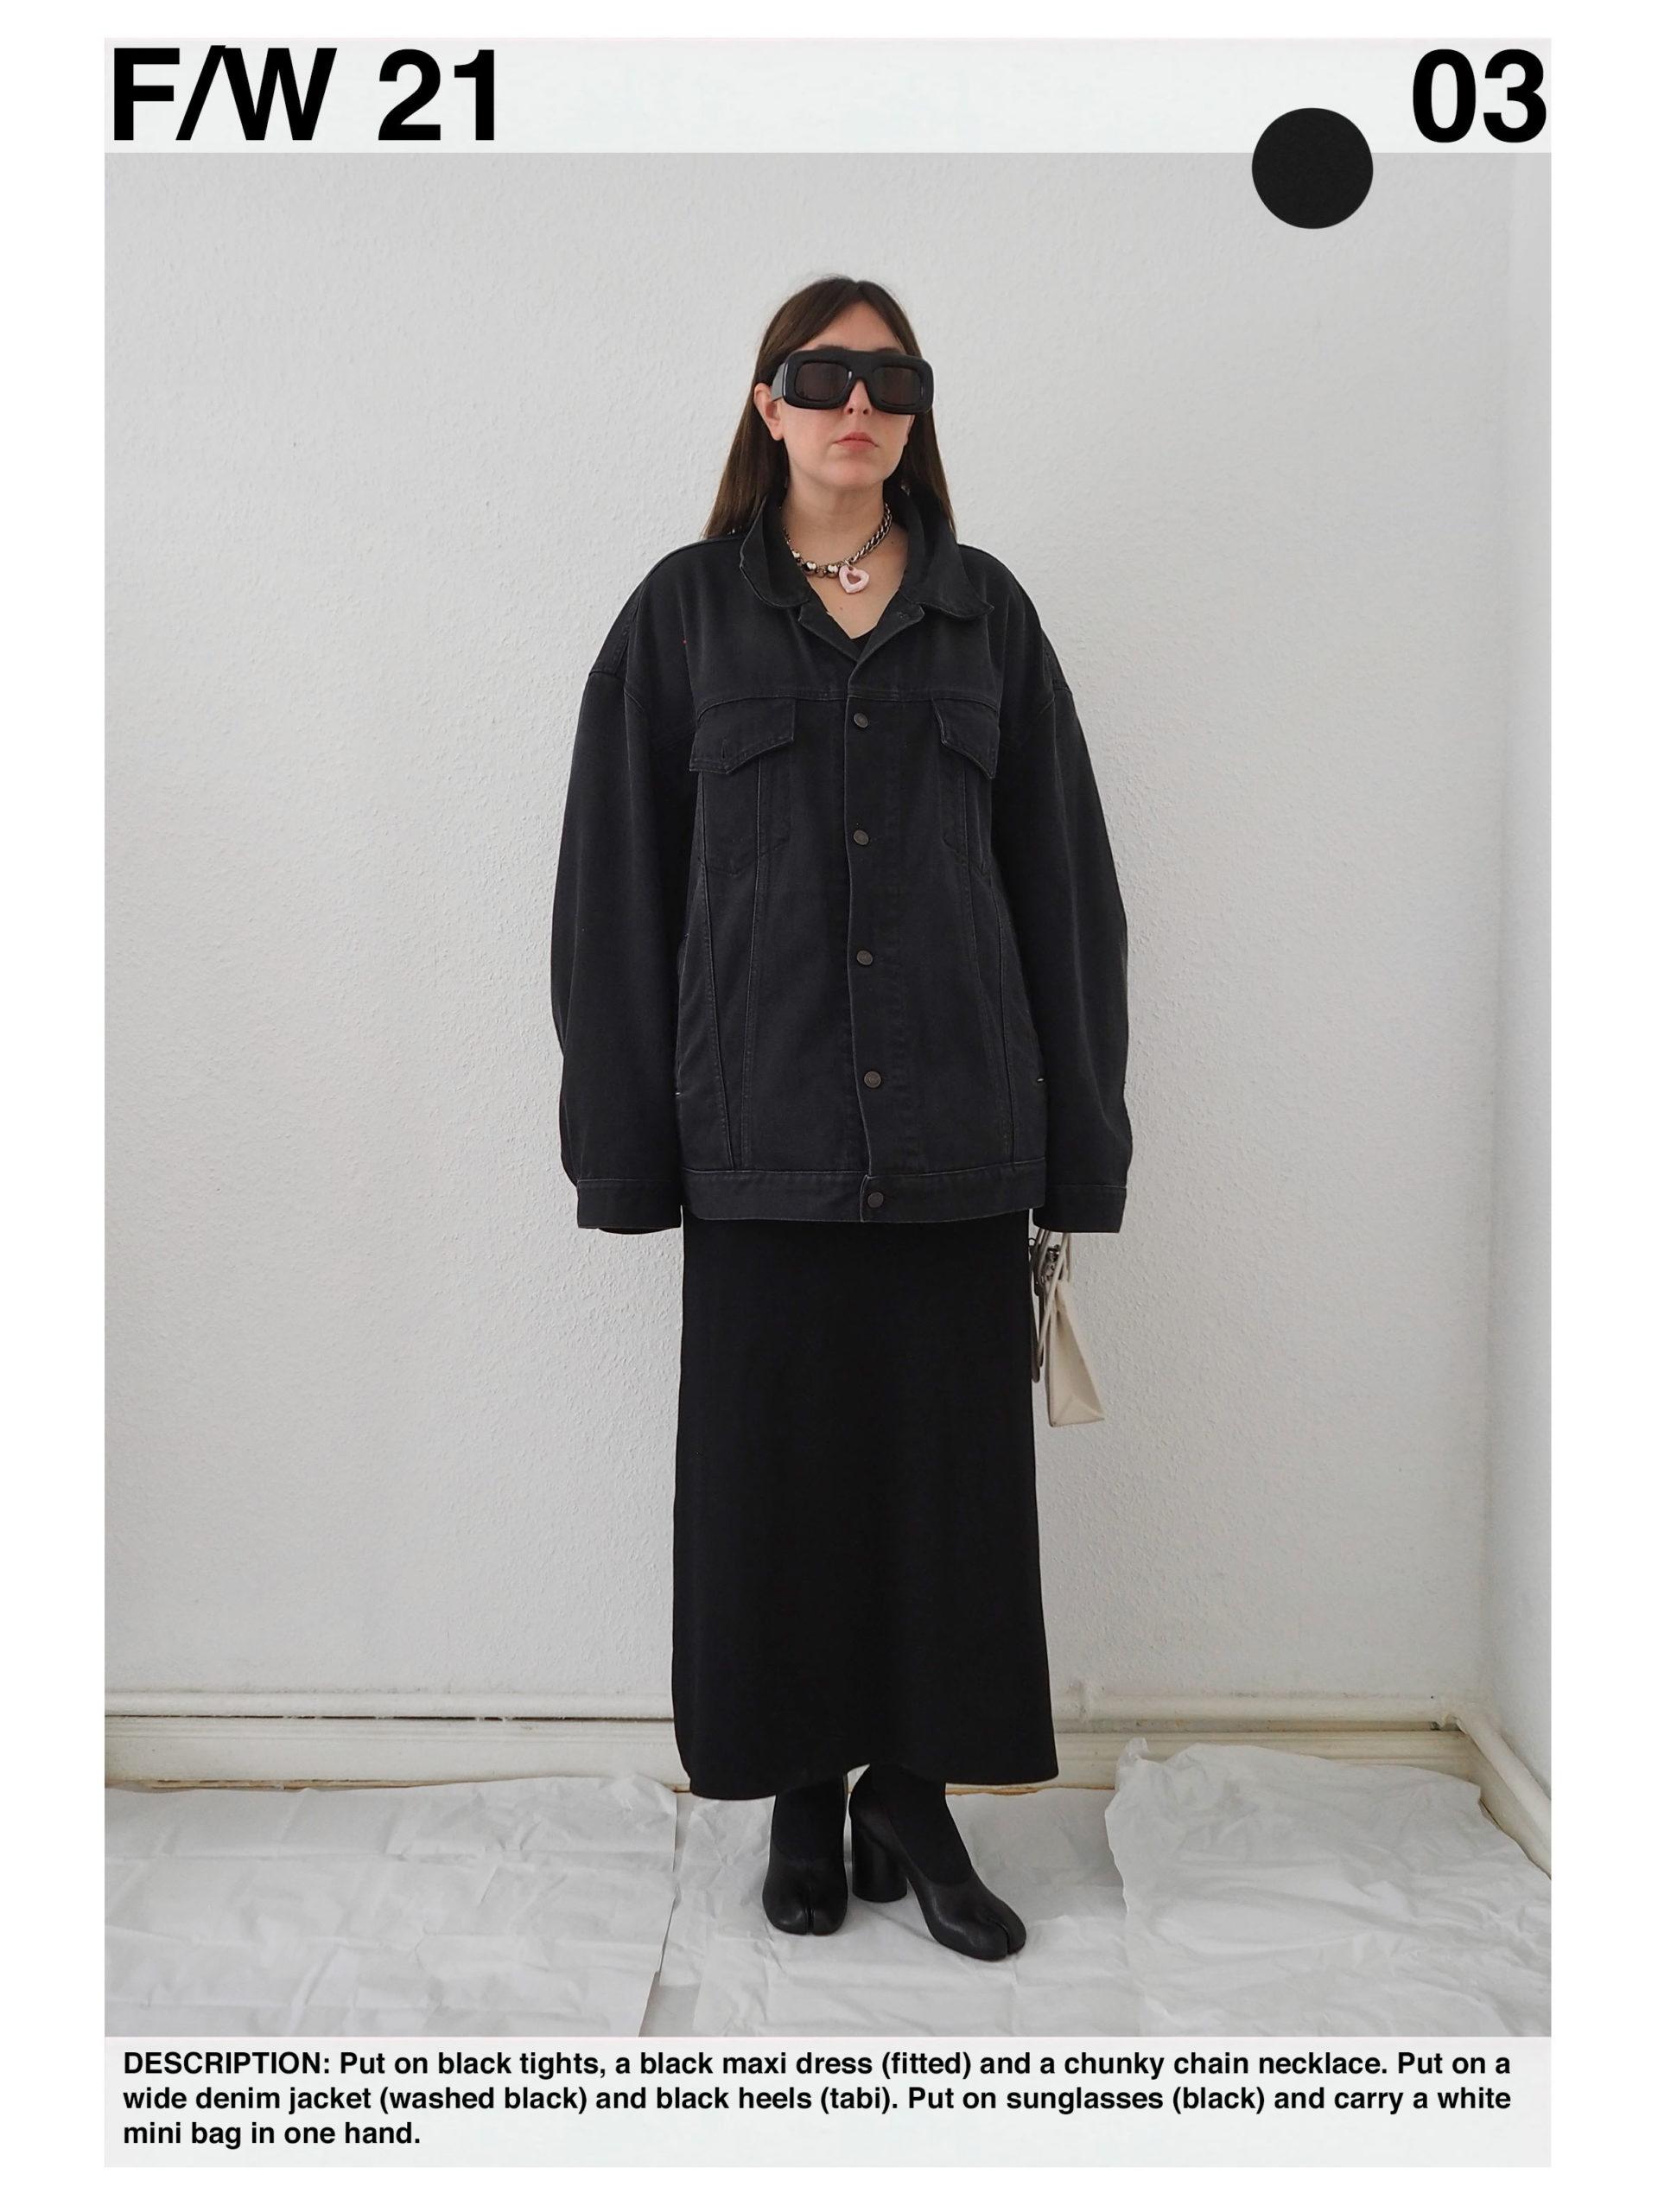 Outfit: black Toteme maxi dress, oversized black Acne Studios denim jacket, black Maison Margiela tabi pumps, Acne Studios black oversized sunglasses, Acne Studios chunky chain necklace, white Medea mini bag